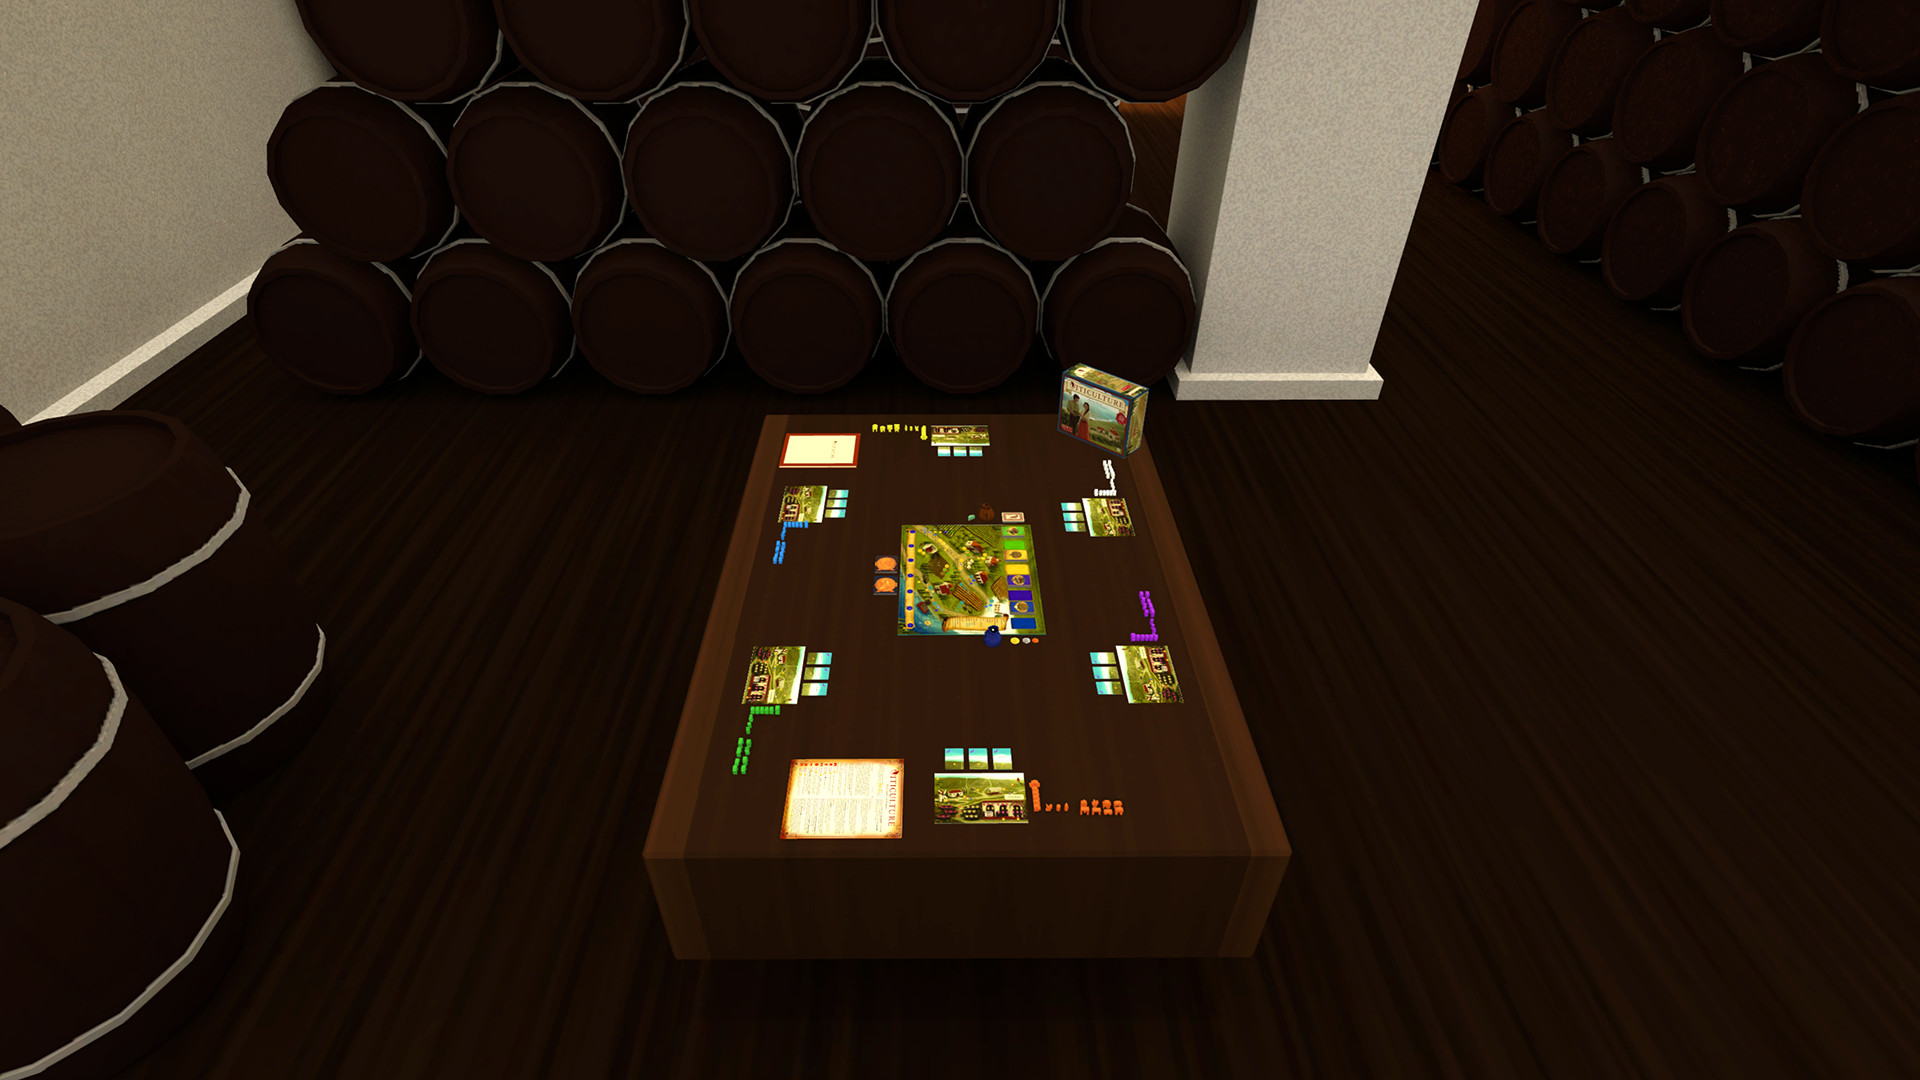 tabletop-simulator-viticulture-setup-free-download